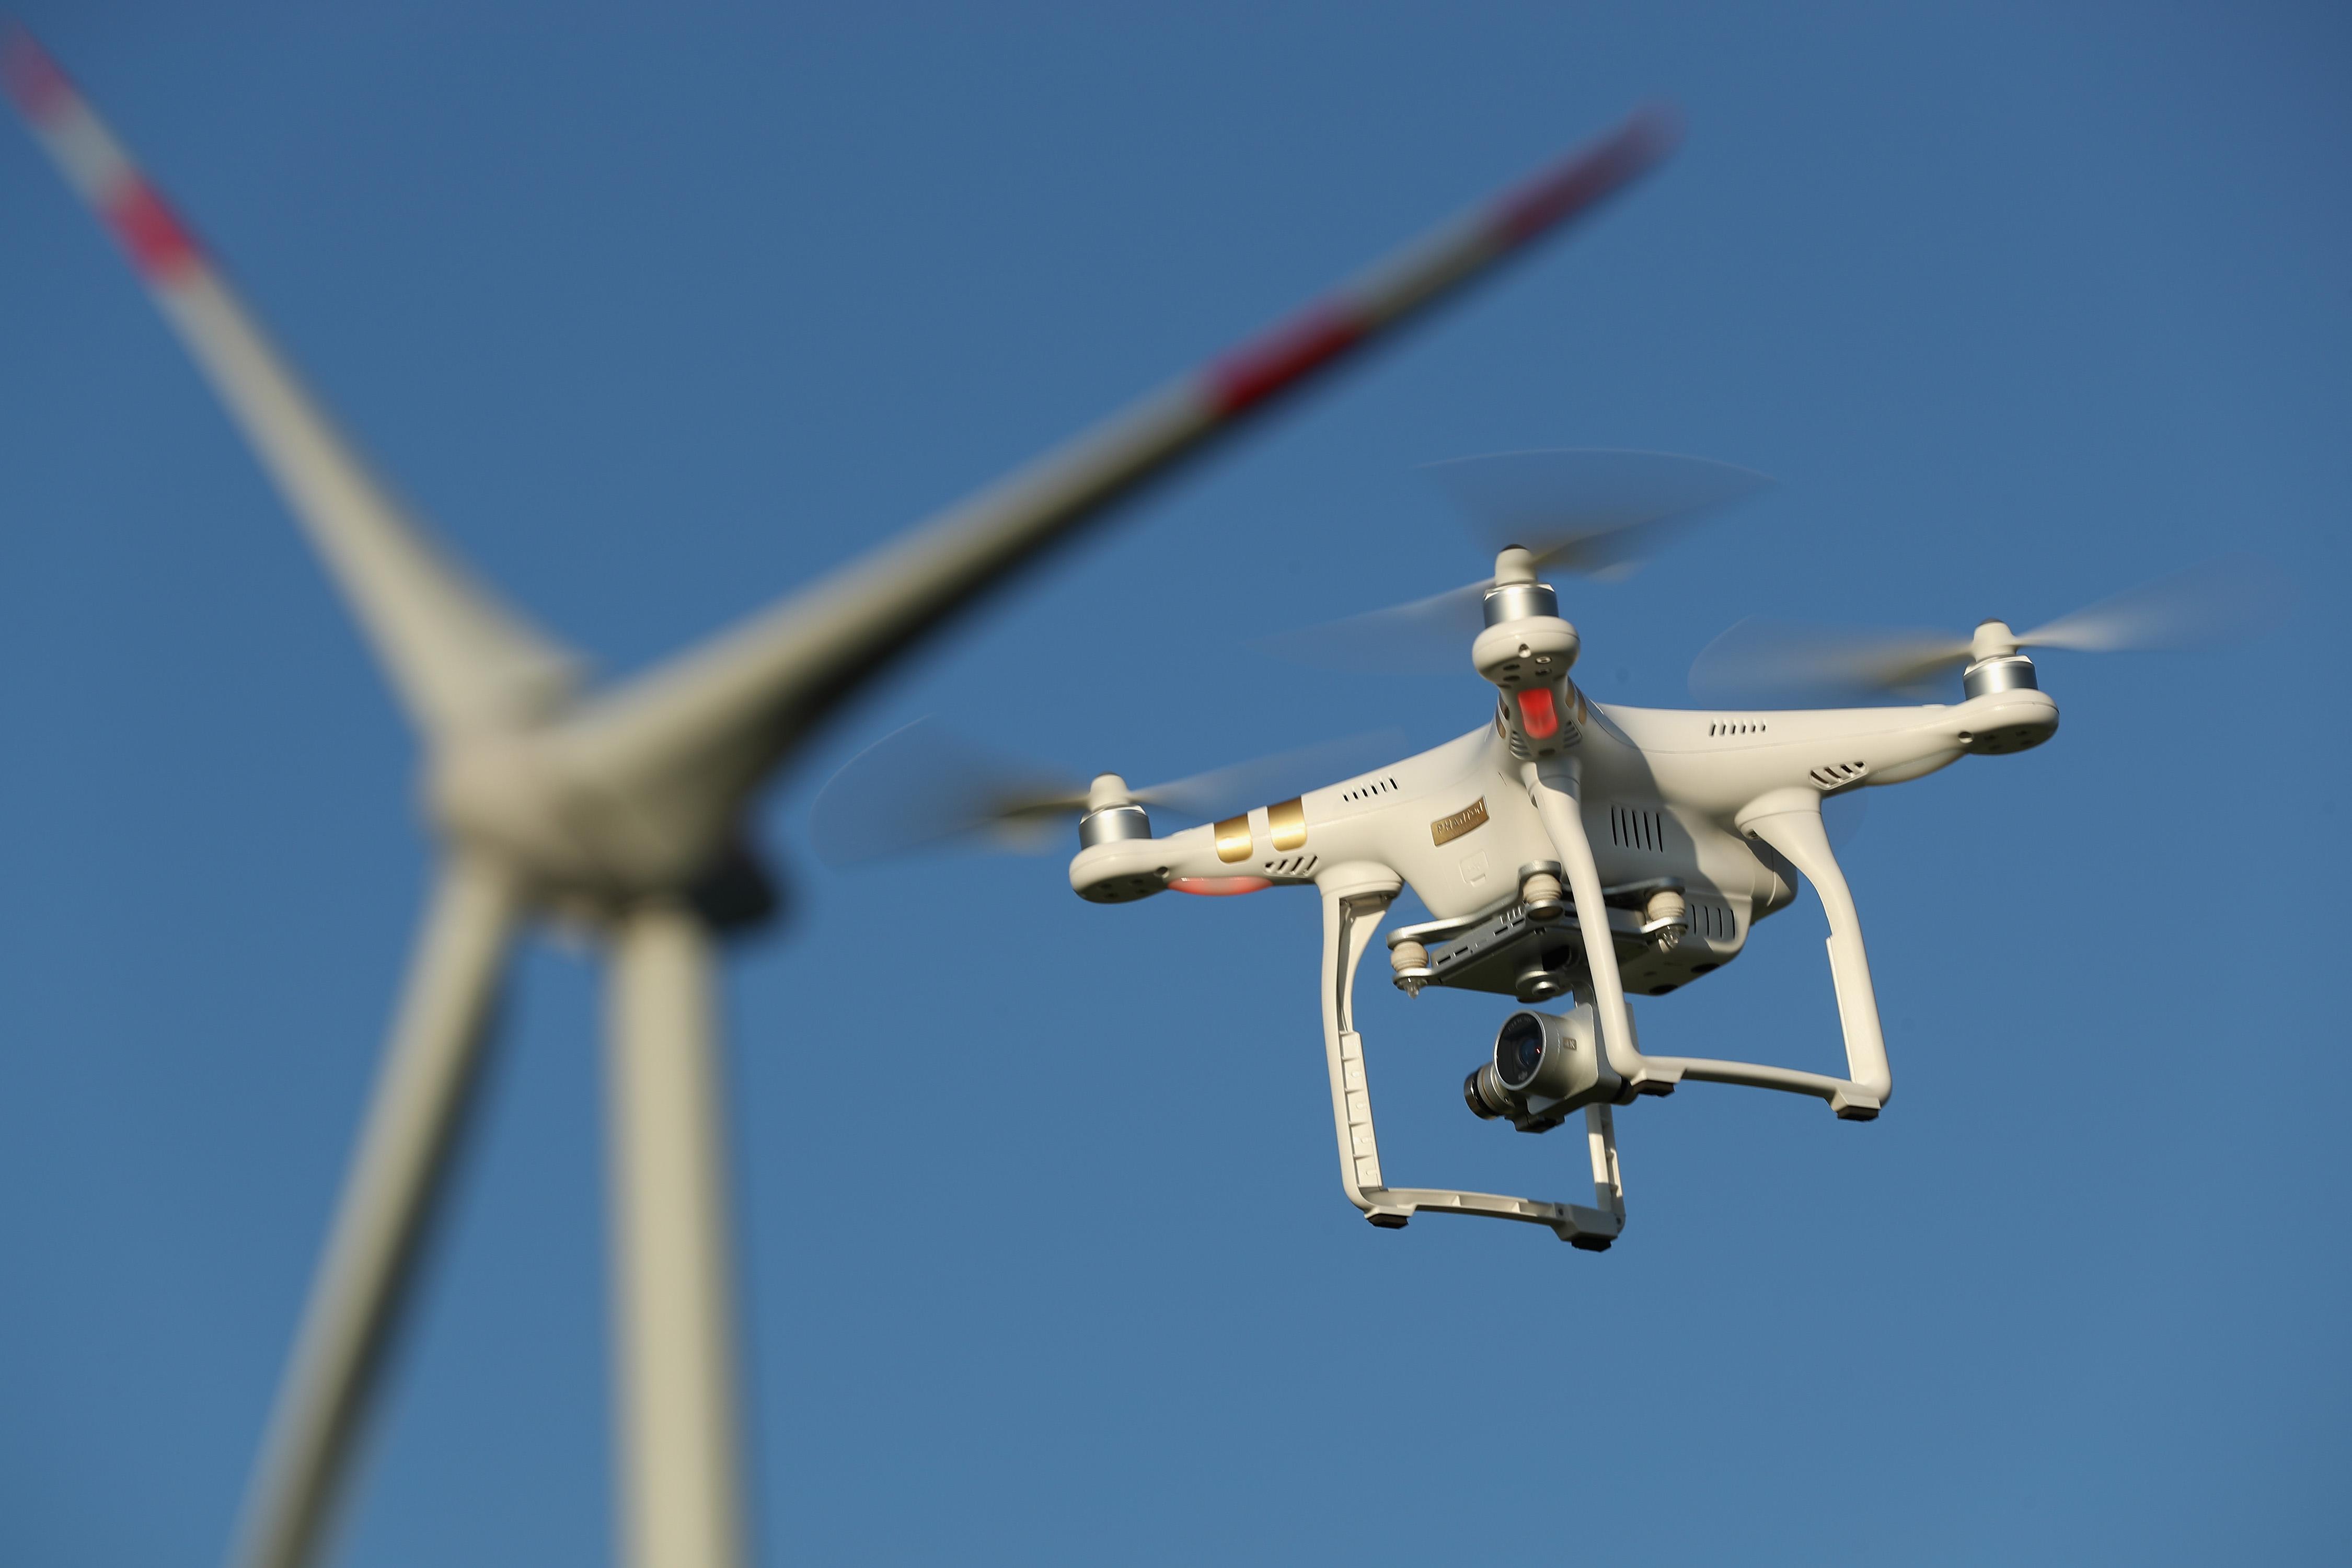 The photographer's DJI Phantom 3 Pro multirotor drone flies near a wind farm on June 8, 2016 near Brueck, Germany. Sean Gallup—Getty Images